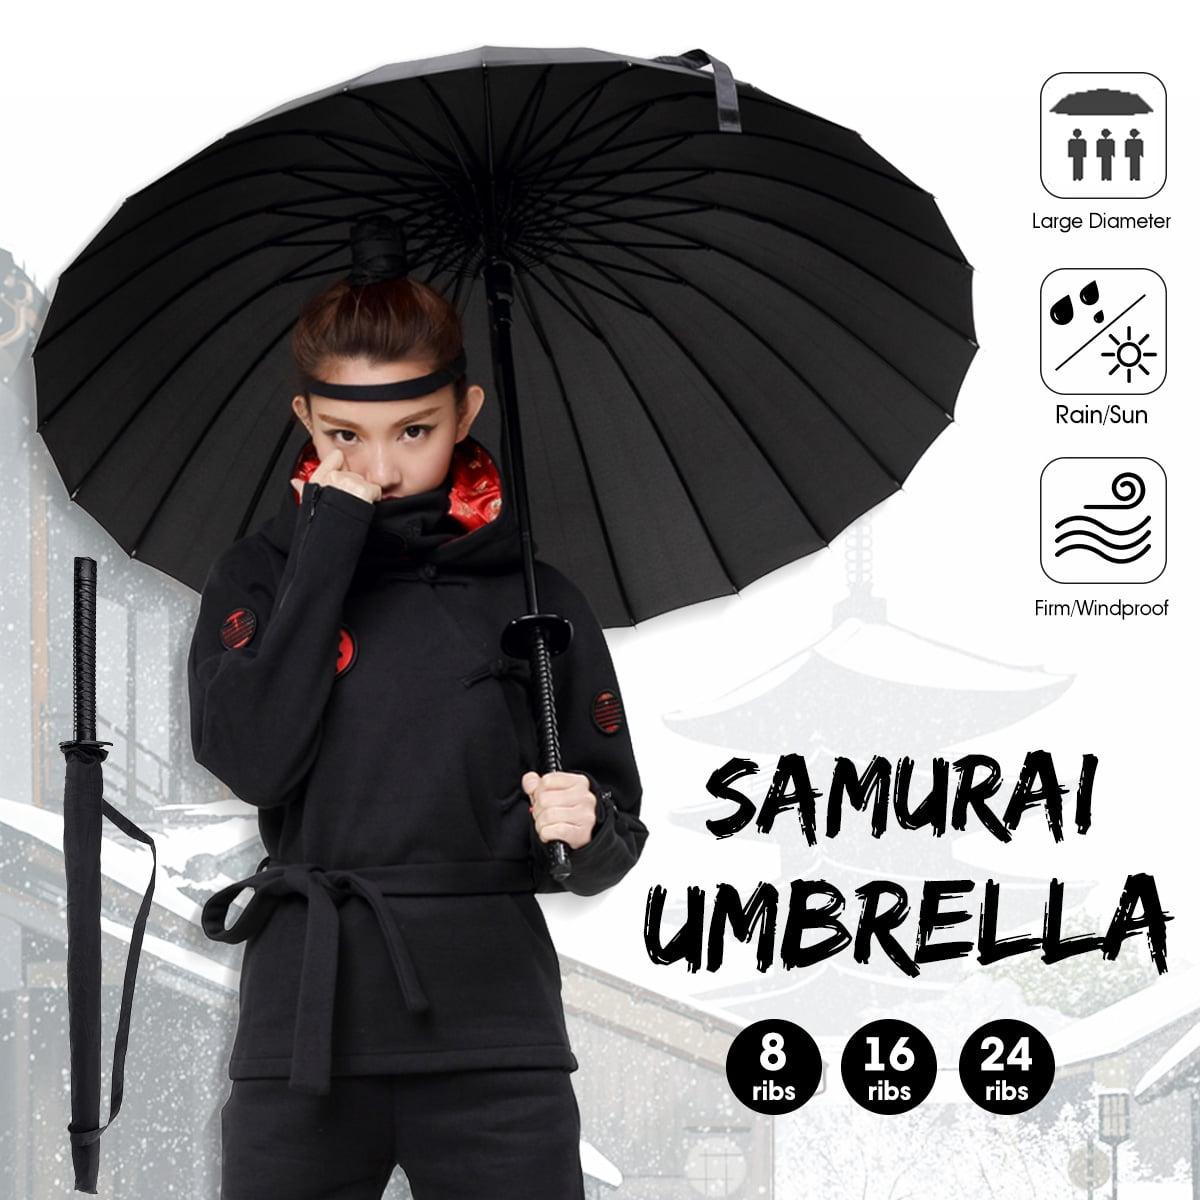 Automatic Open 8//16//24 Ribs Umbrella Sword Handle Sun Rain Wind Proof With Bag